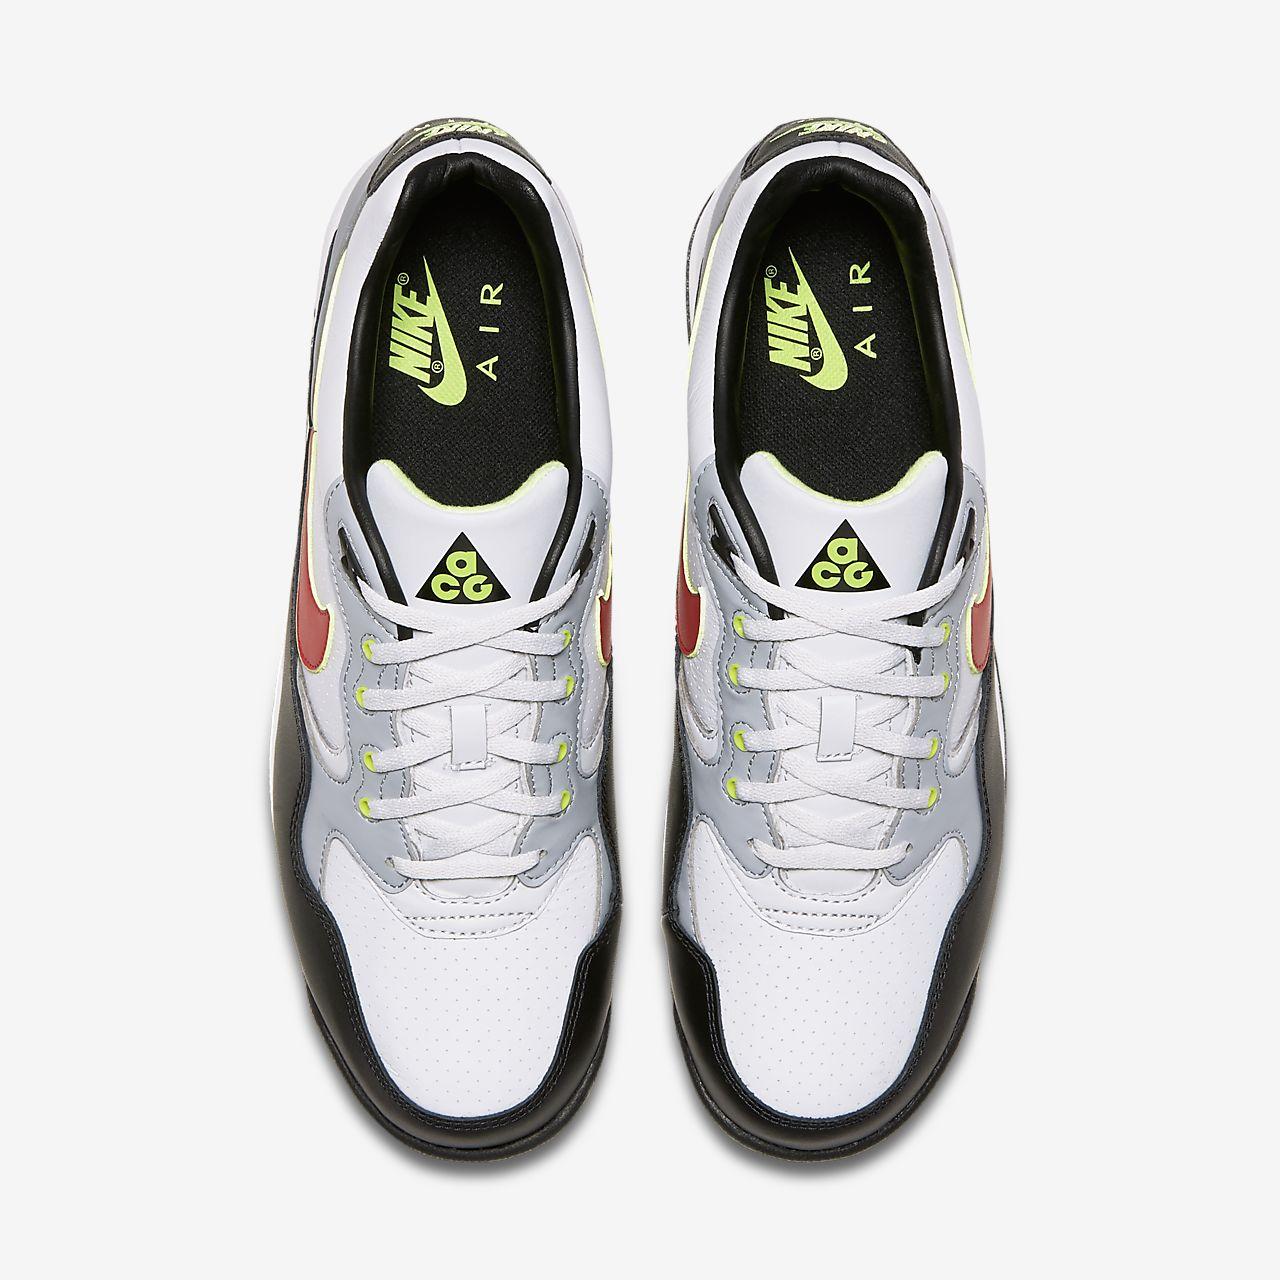 d670a16938 Nike Air Wildwood ACG Men's Shoe. Nike.com CA